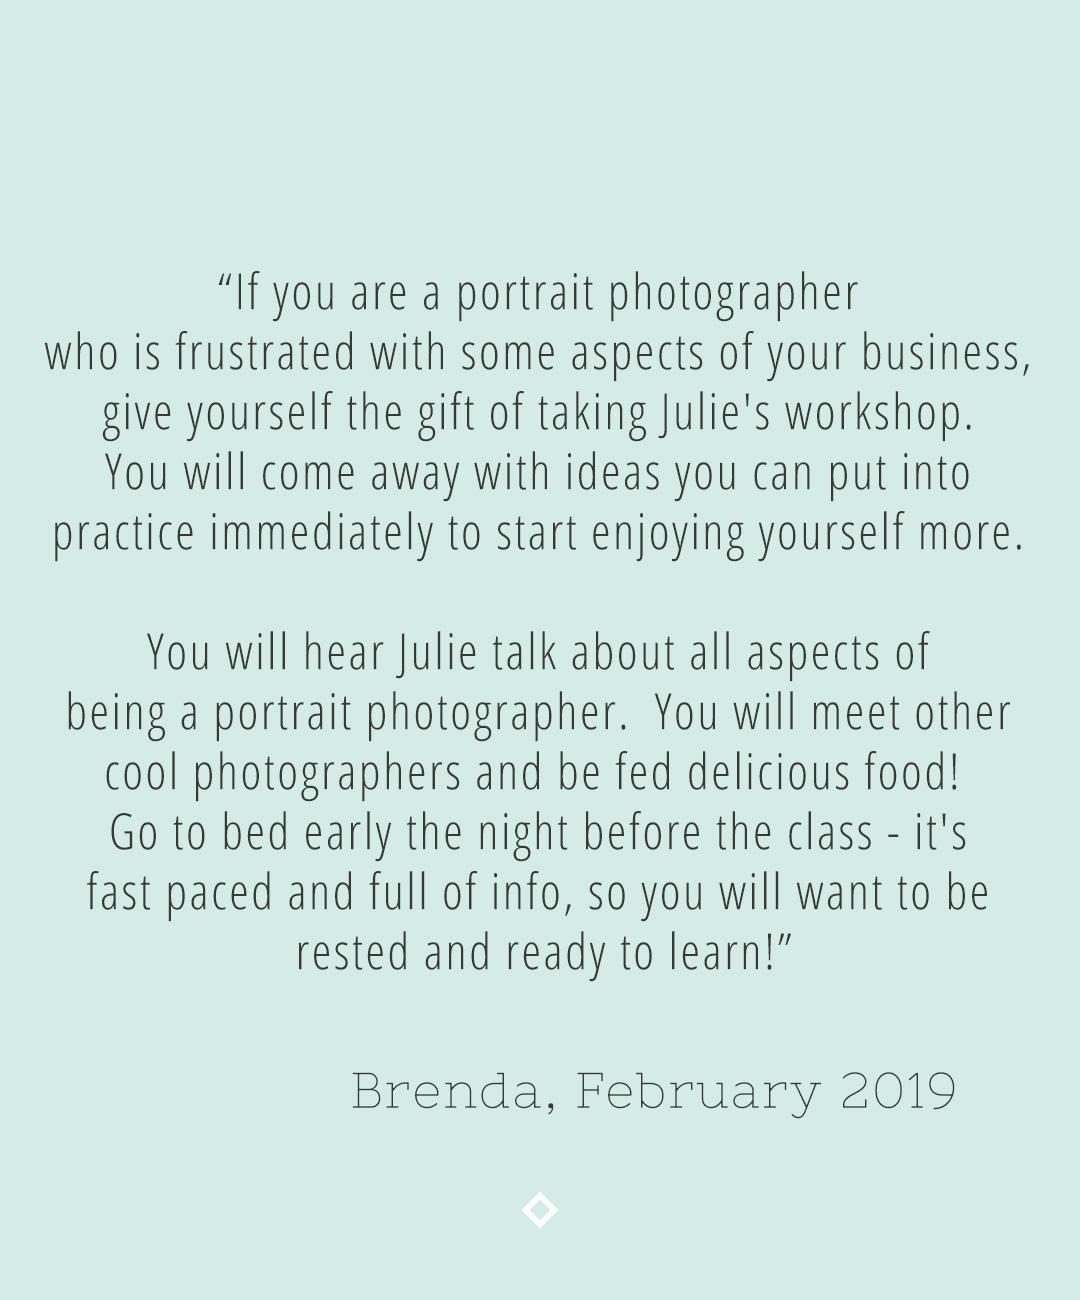 BTestimonialCard-Brenda.jpg